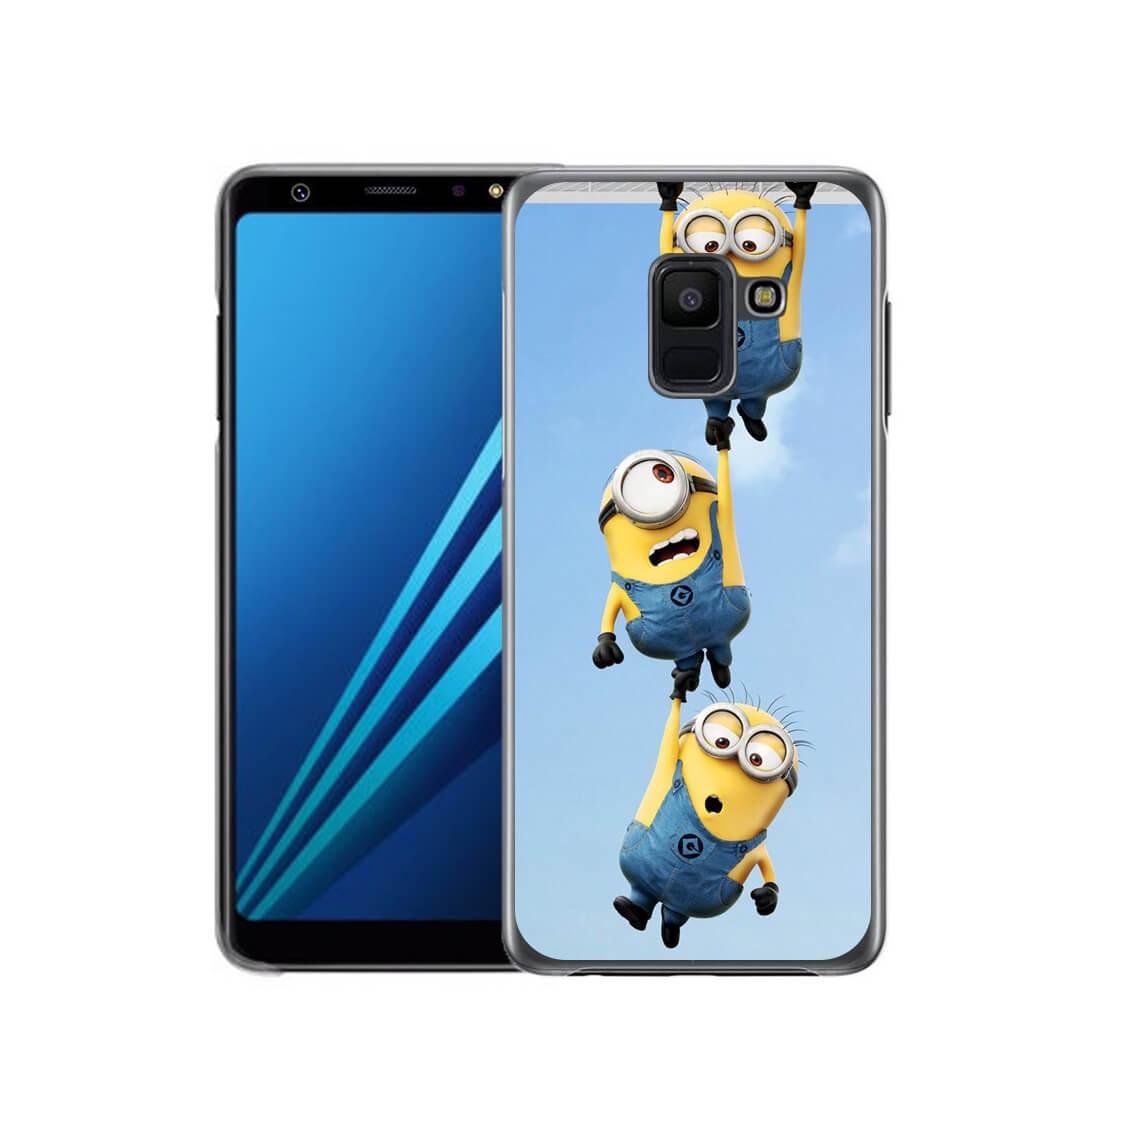 FORCELL MY ART kryt Samsung Galaxy A6 (A600) MIMONI (021)